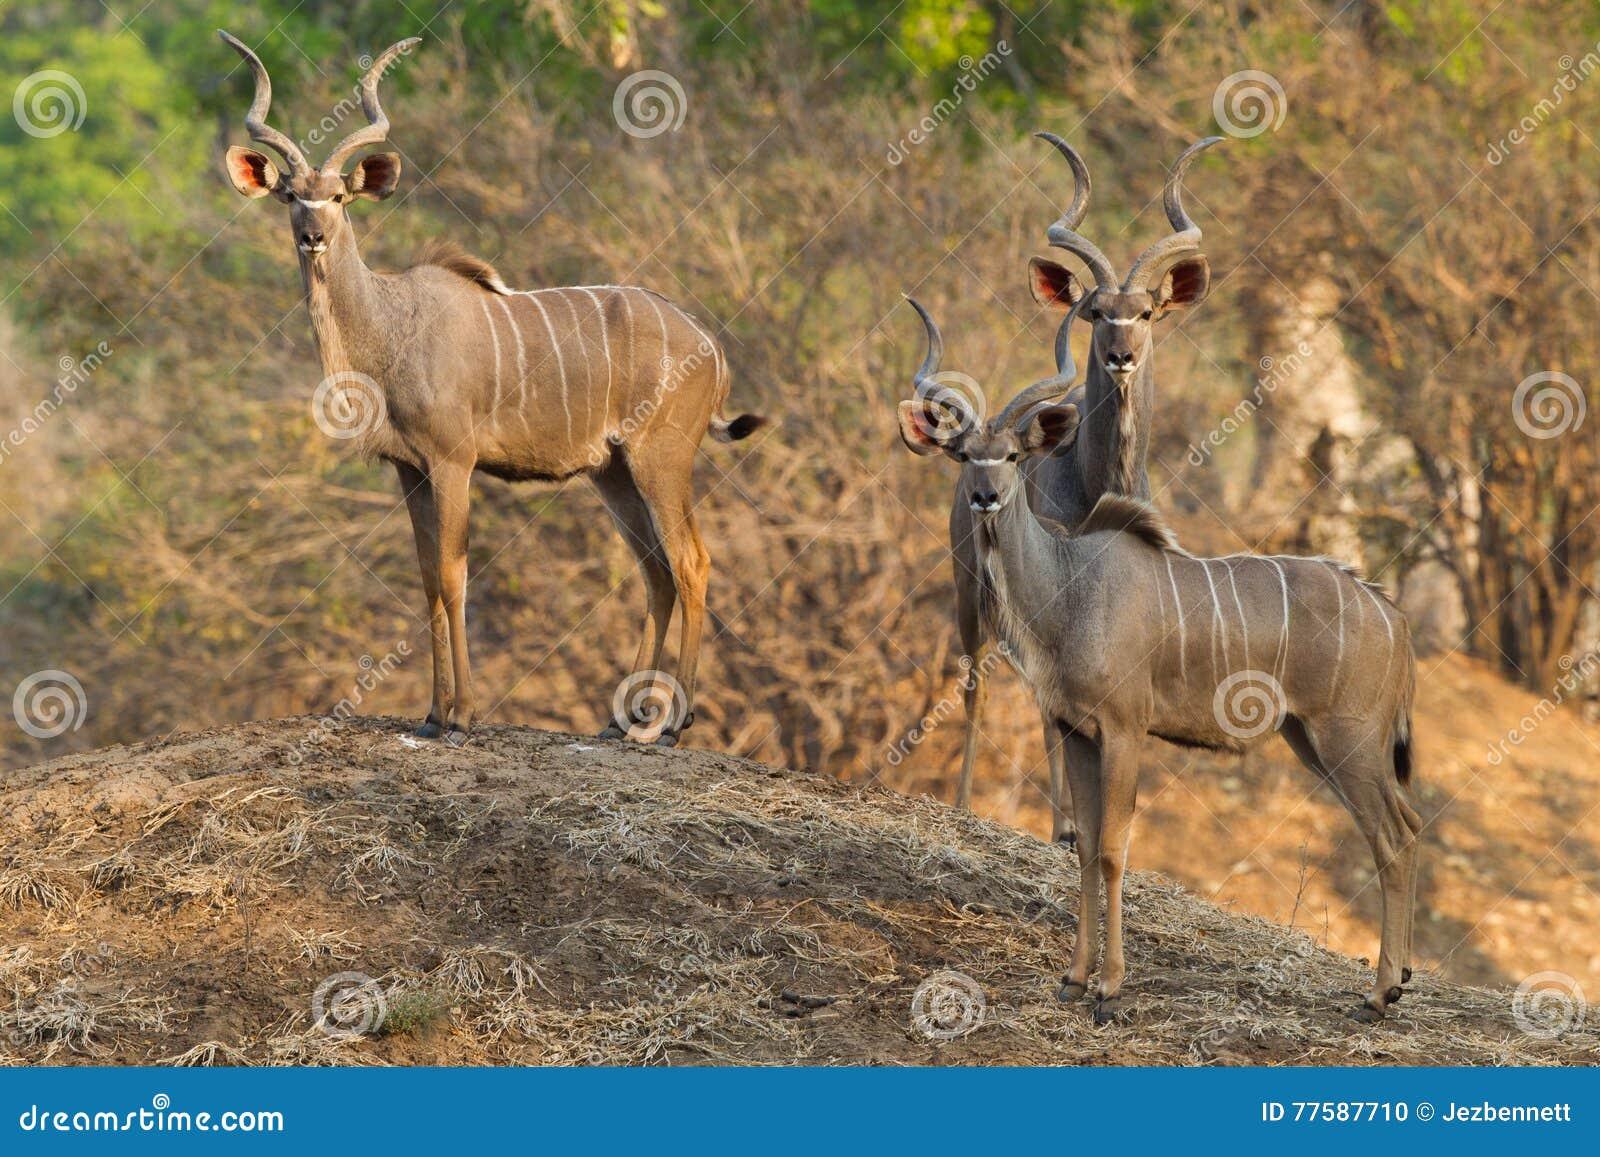 Greater Kudu bulls standing on termite mound